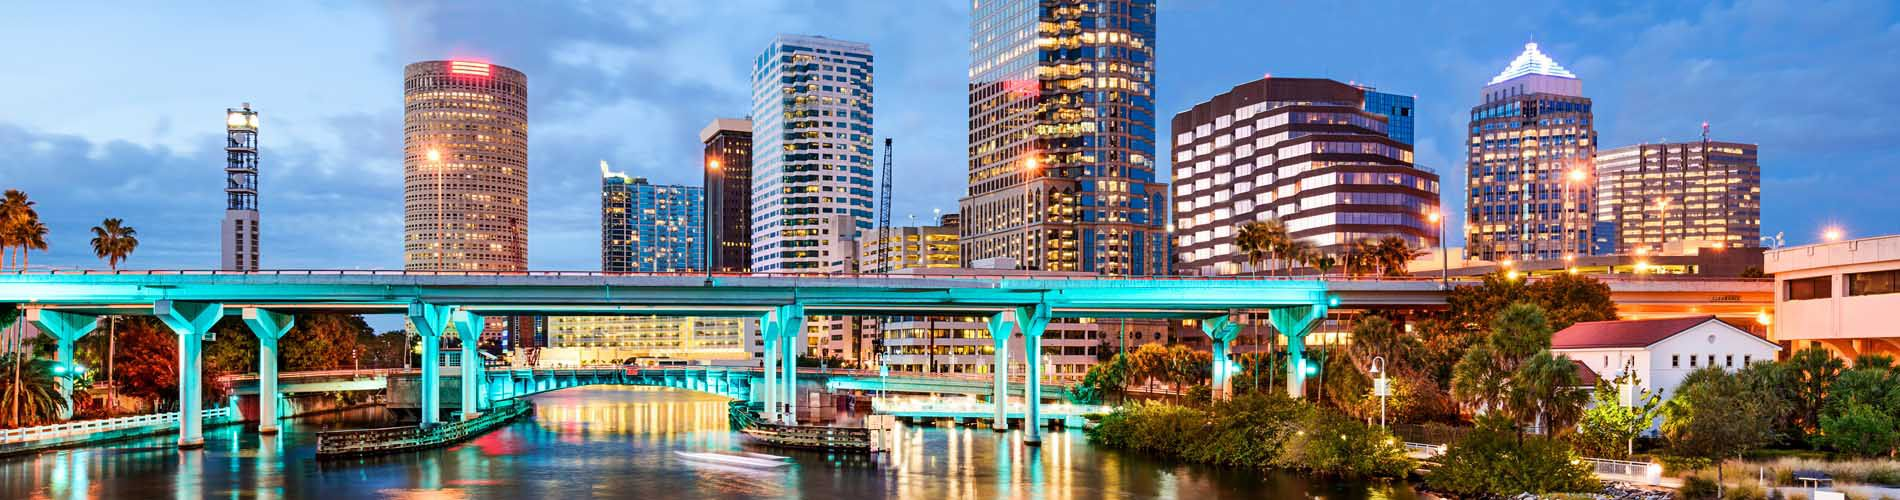 Tampa Metals Service Center Warehouse - Florida | McNICHOLS®